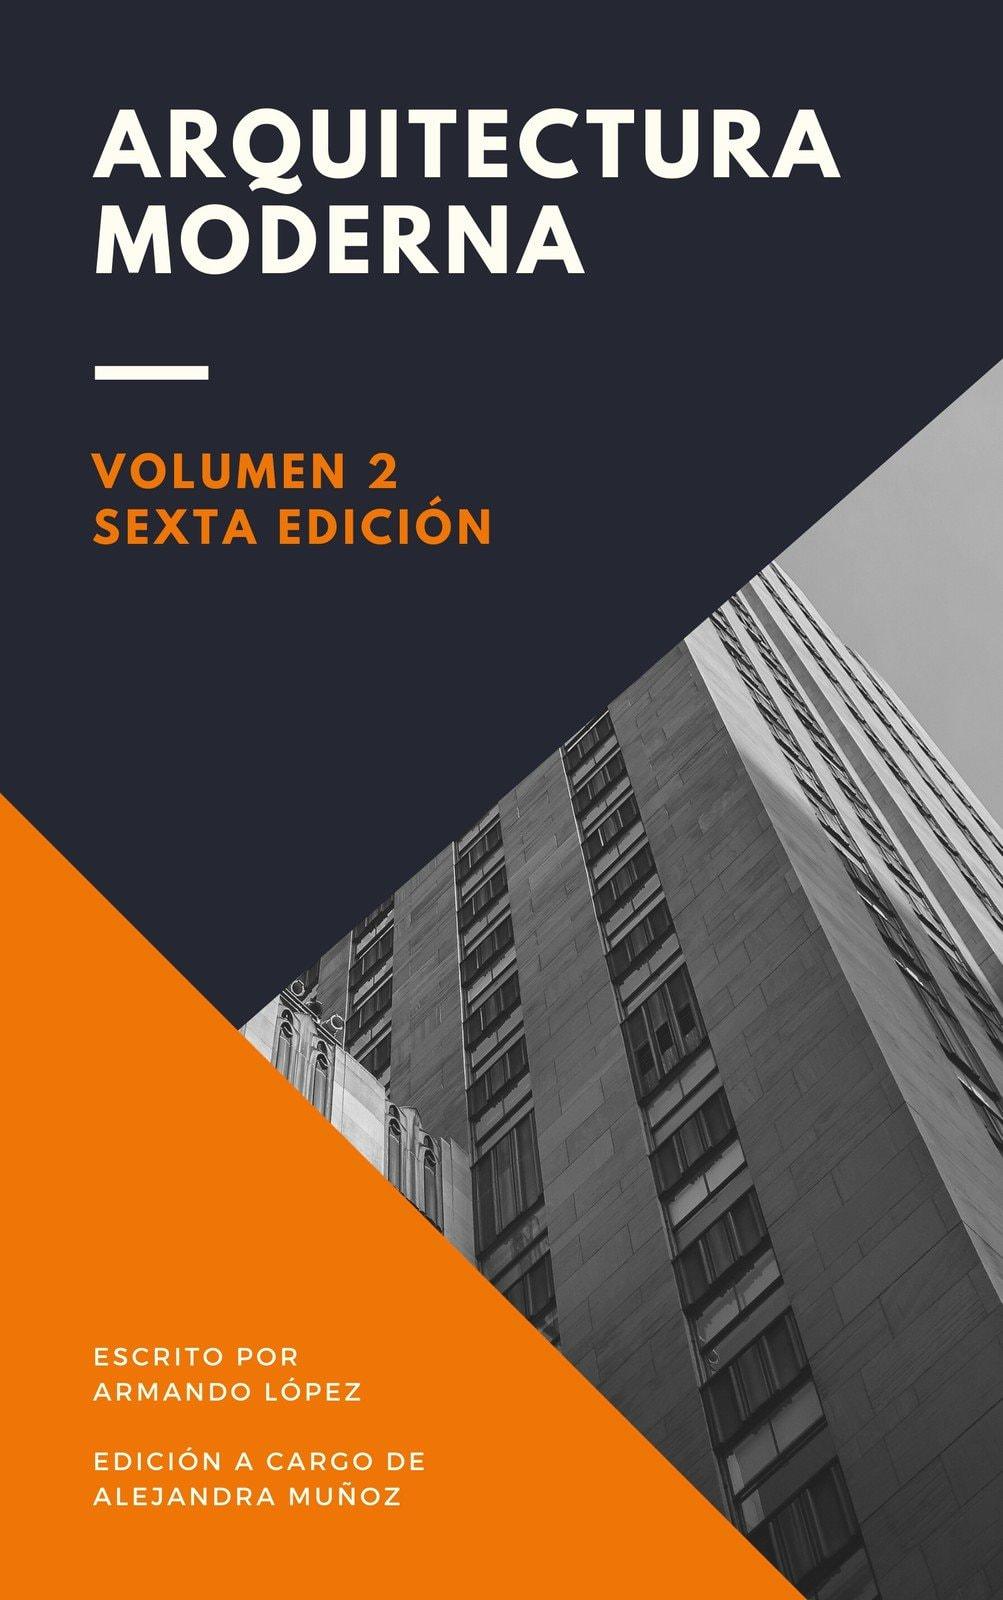 Naranja y Oscuro Púrpura Triangular Moderno Arquitectura Libro Portada